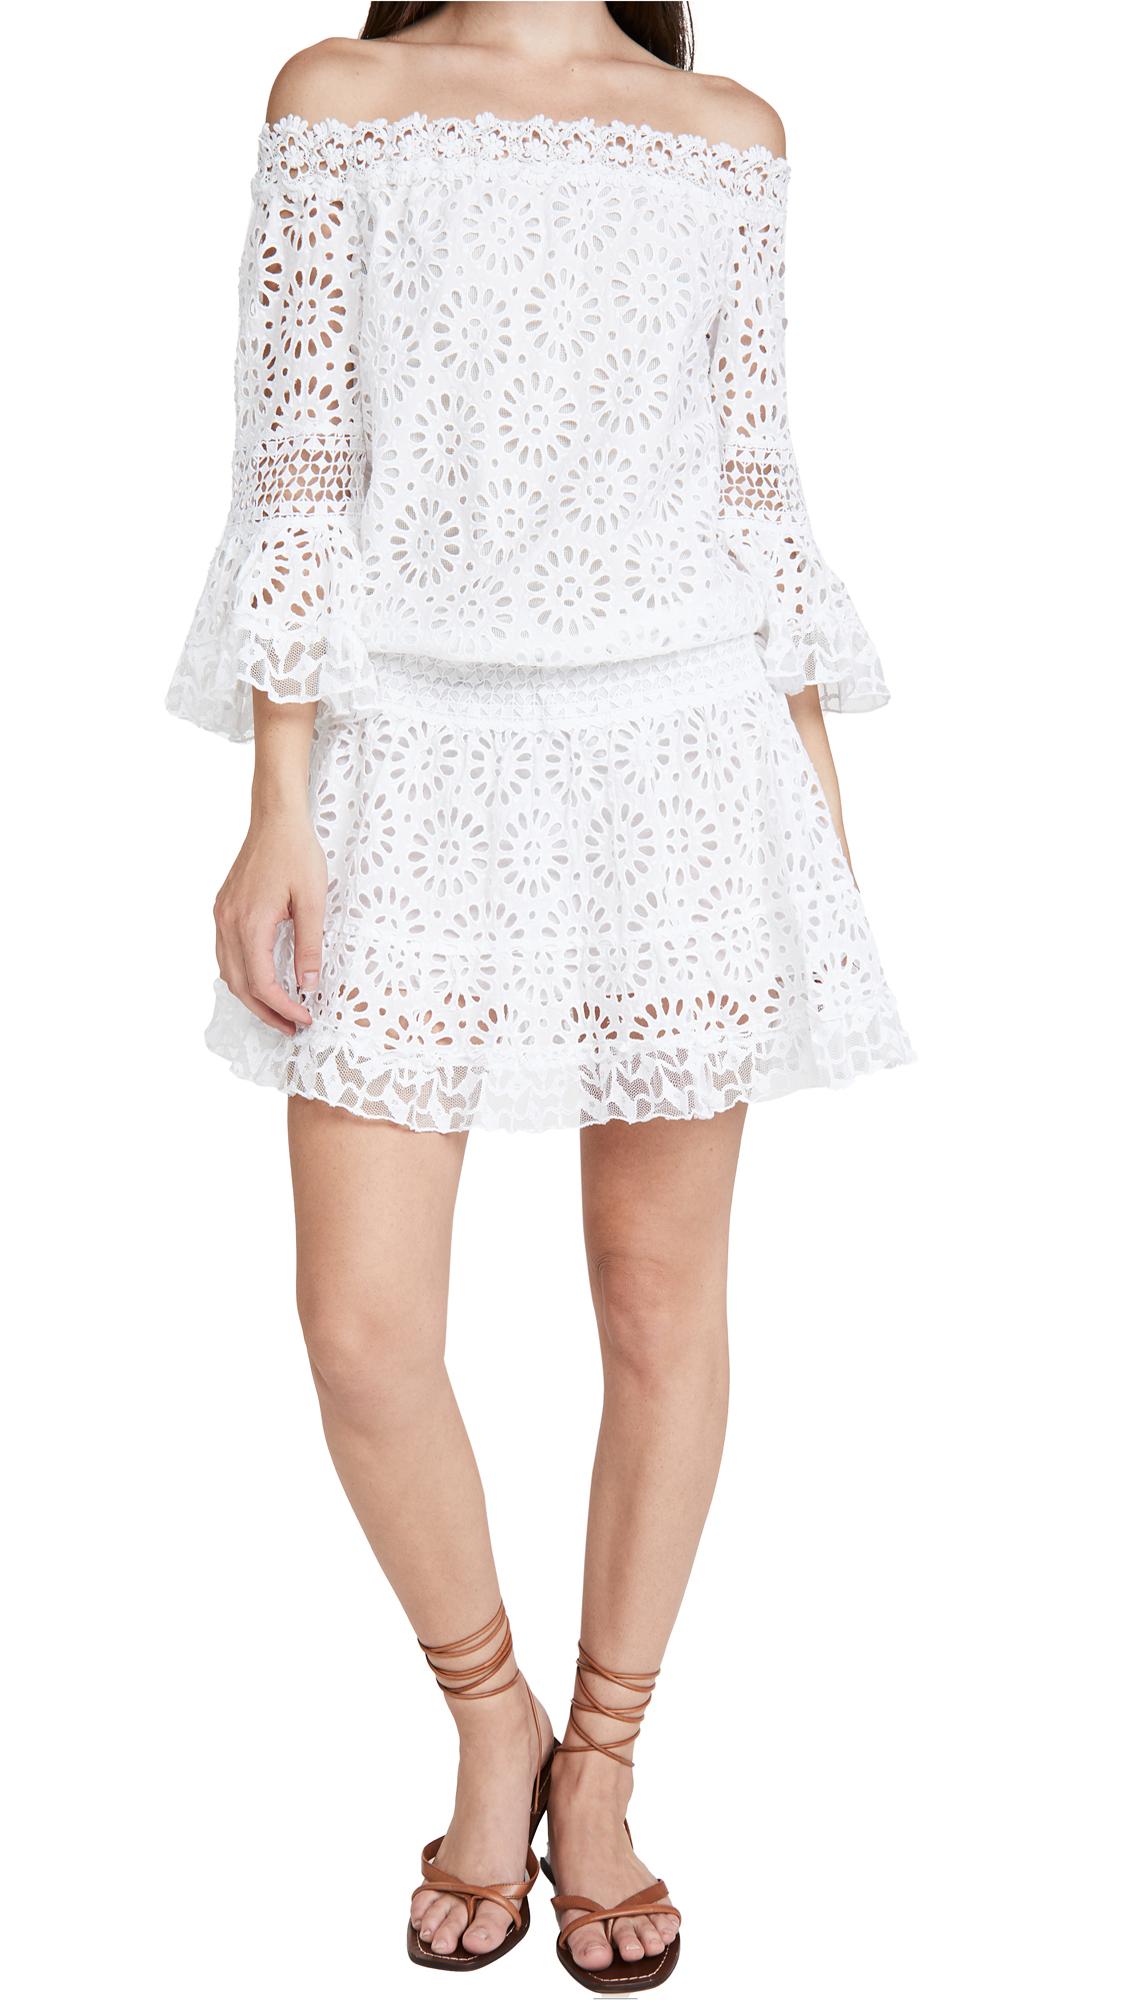 Temptation Positano Tulum Dress